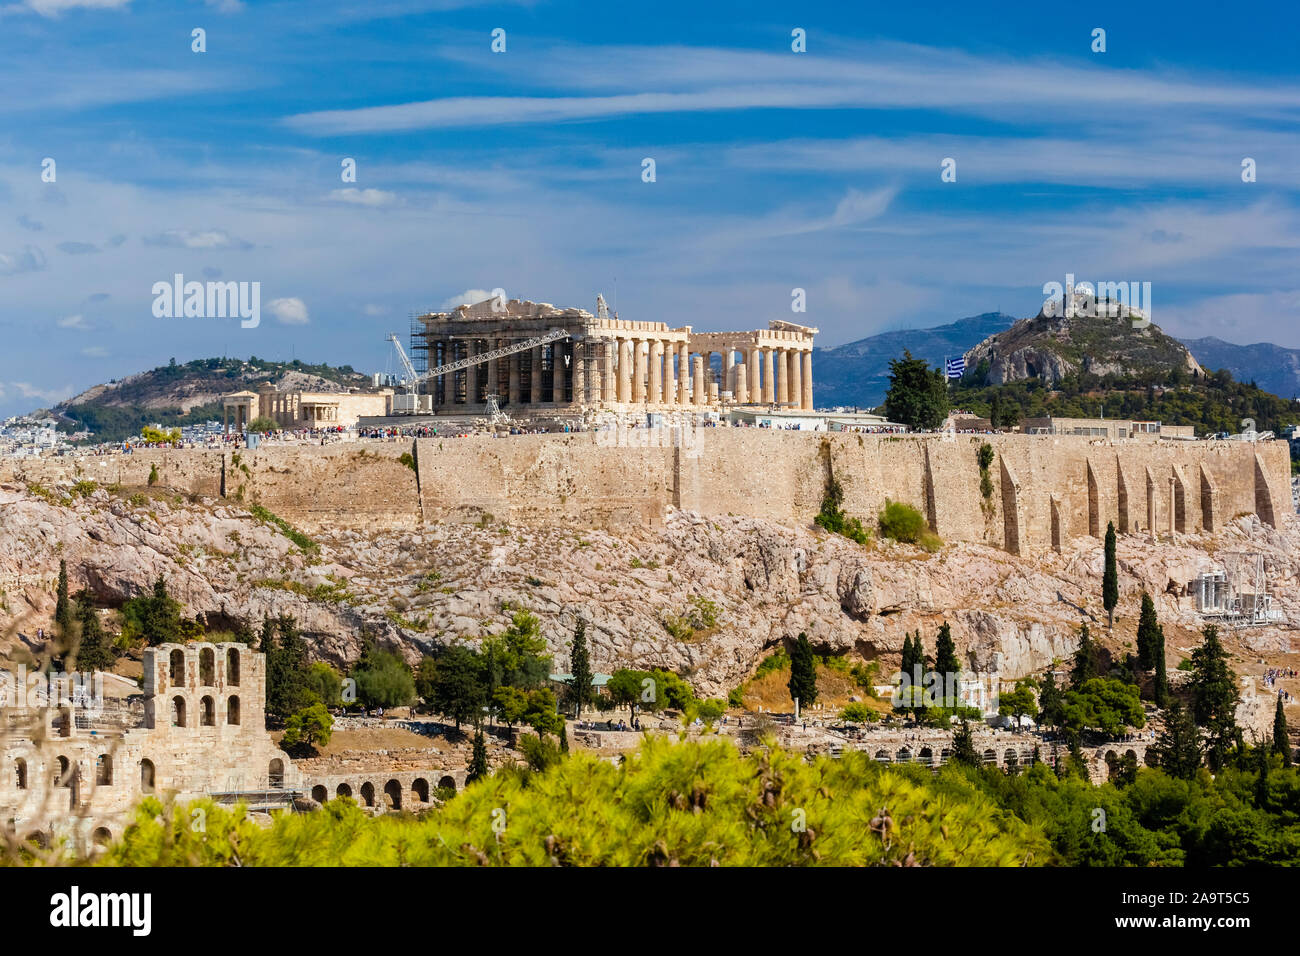 Griechenland, Athen, Akropolis, Partheneon, Stock Photo